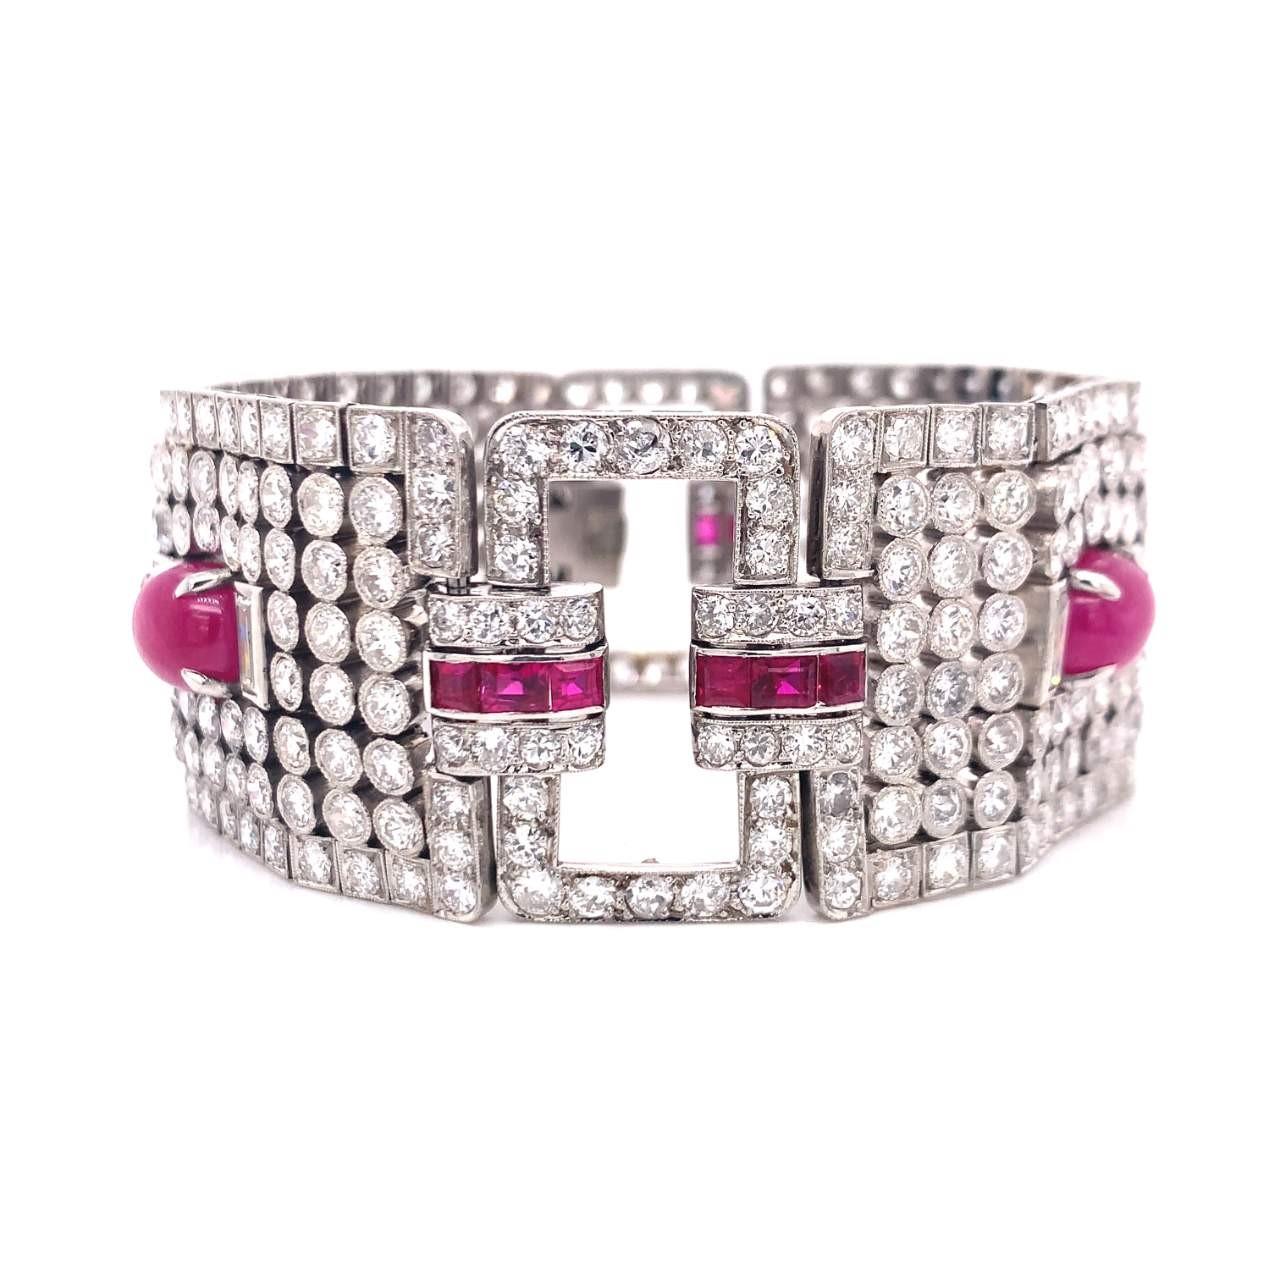 Art_Deco_Ruby_And_Diamond_Bracelet